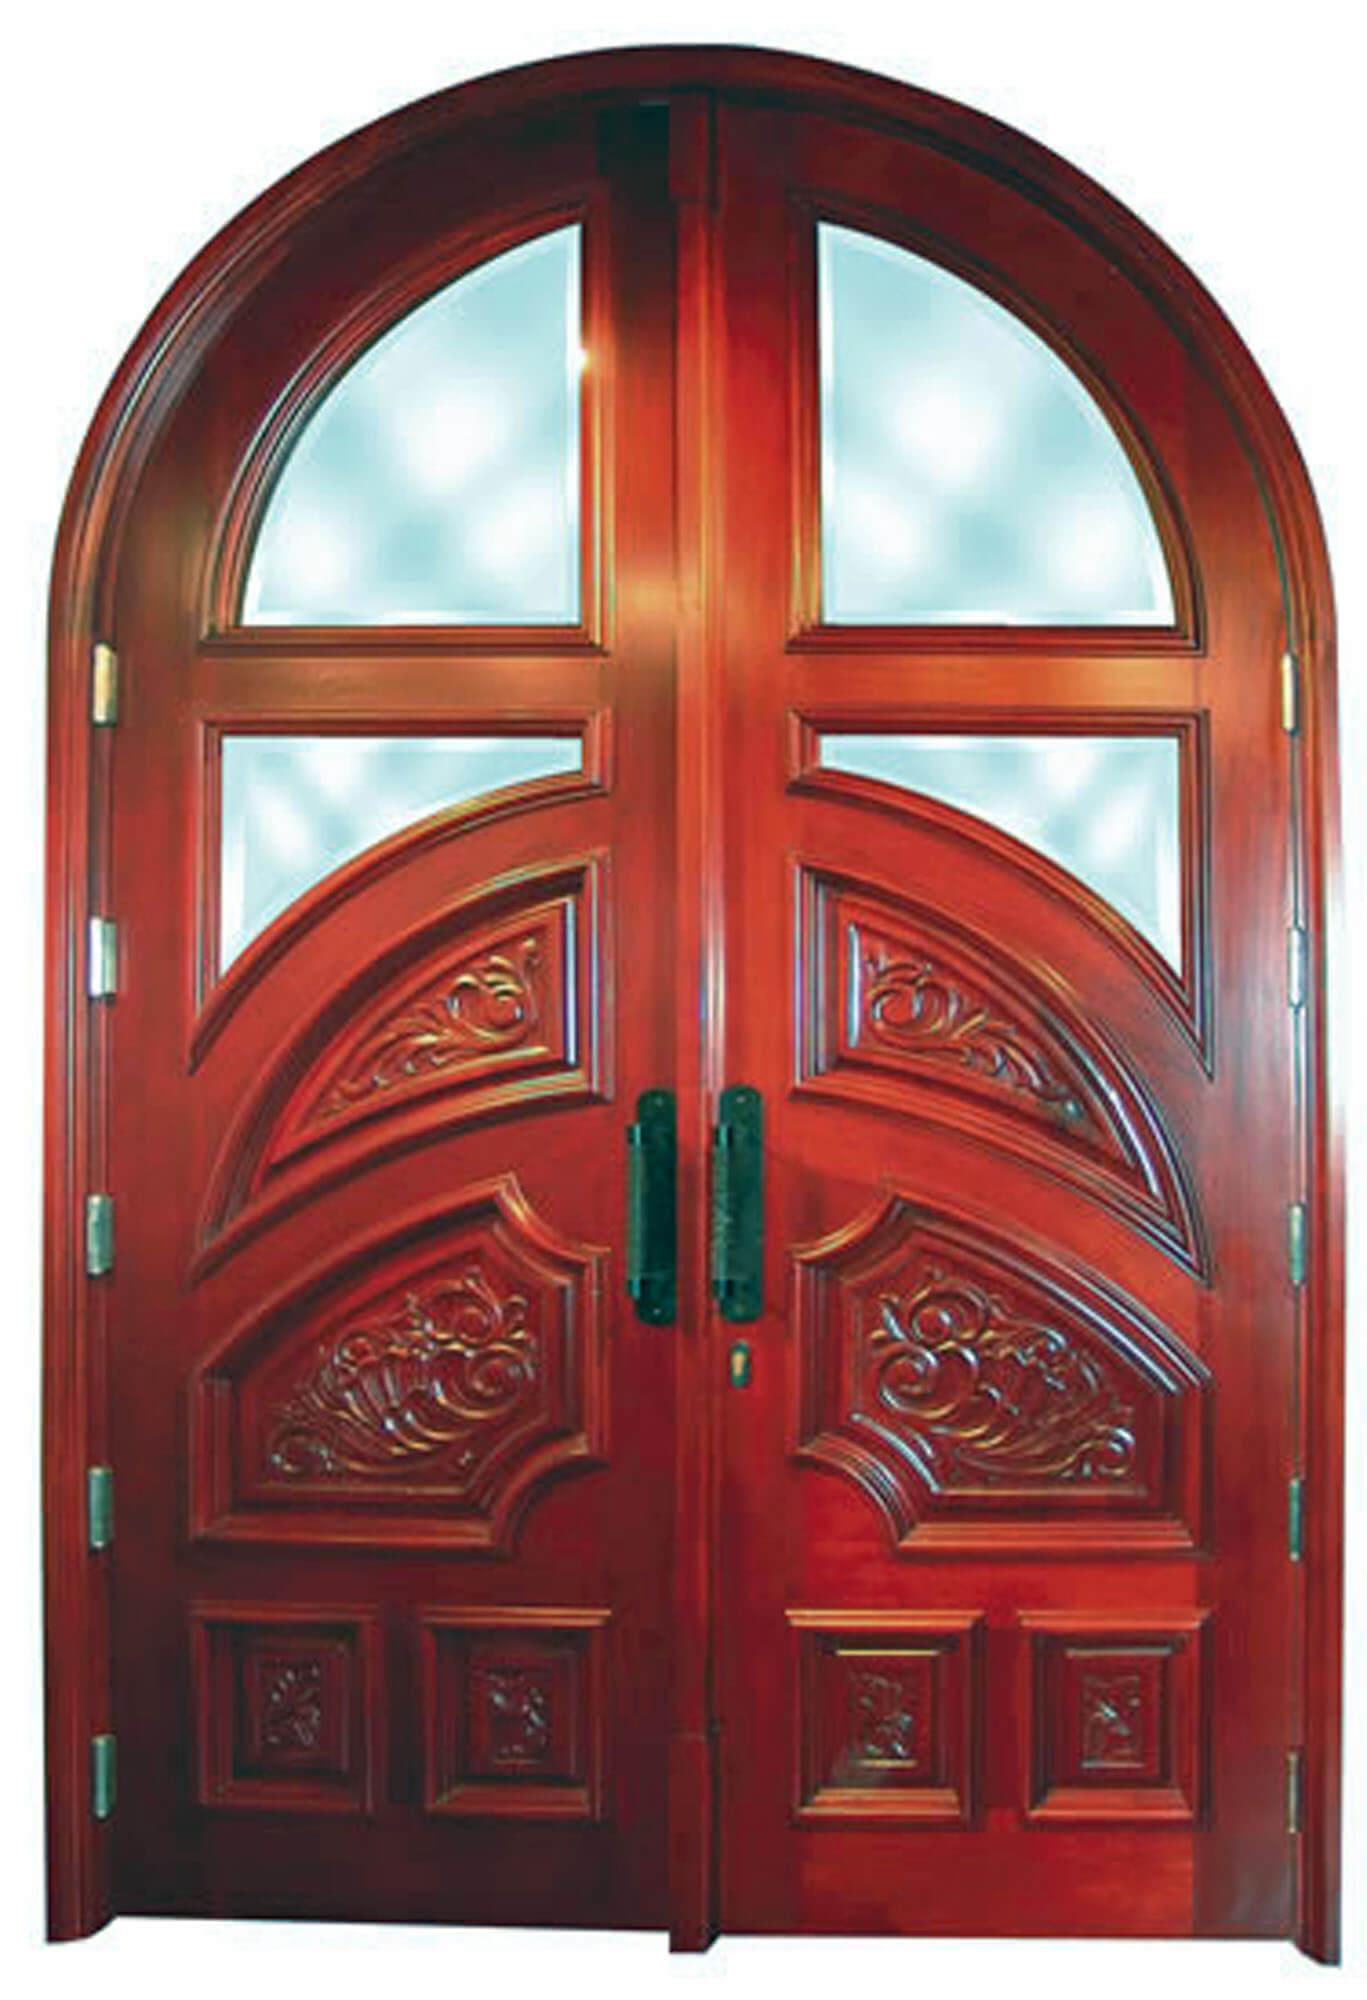 Pensacola Mahogany Entrance Doors